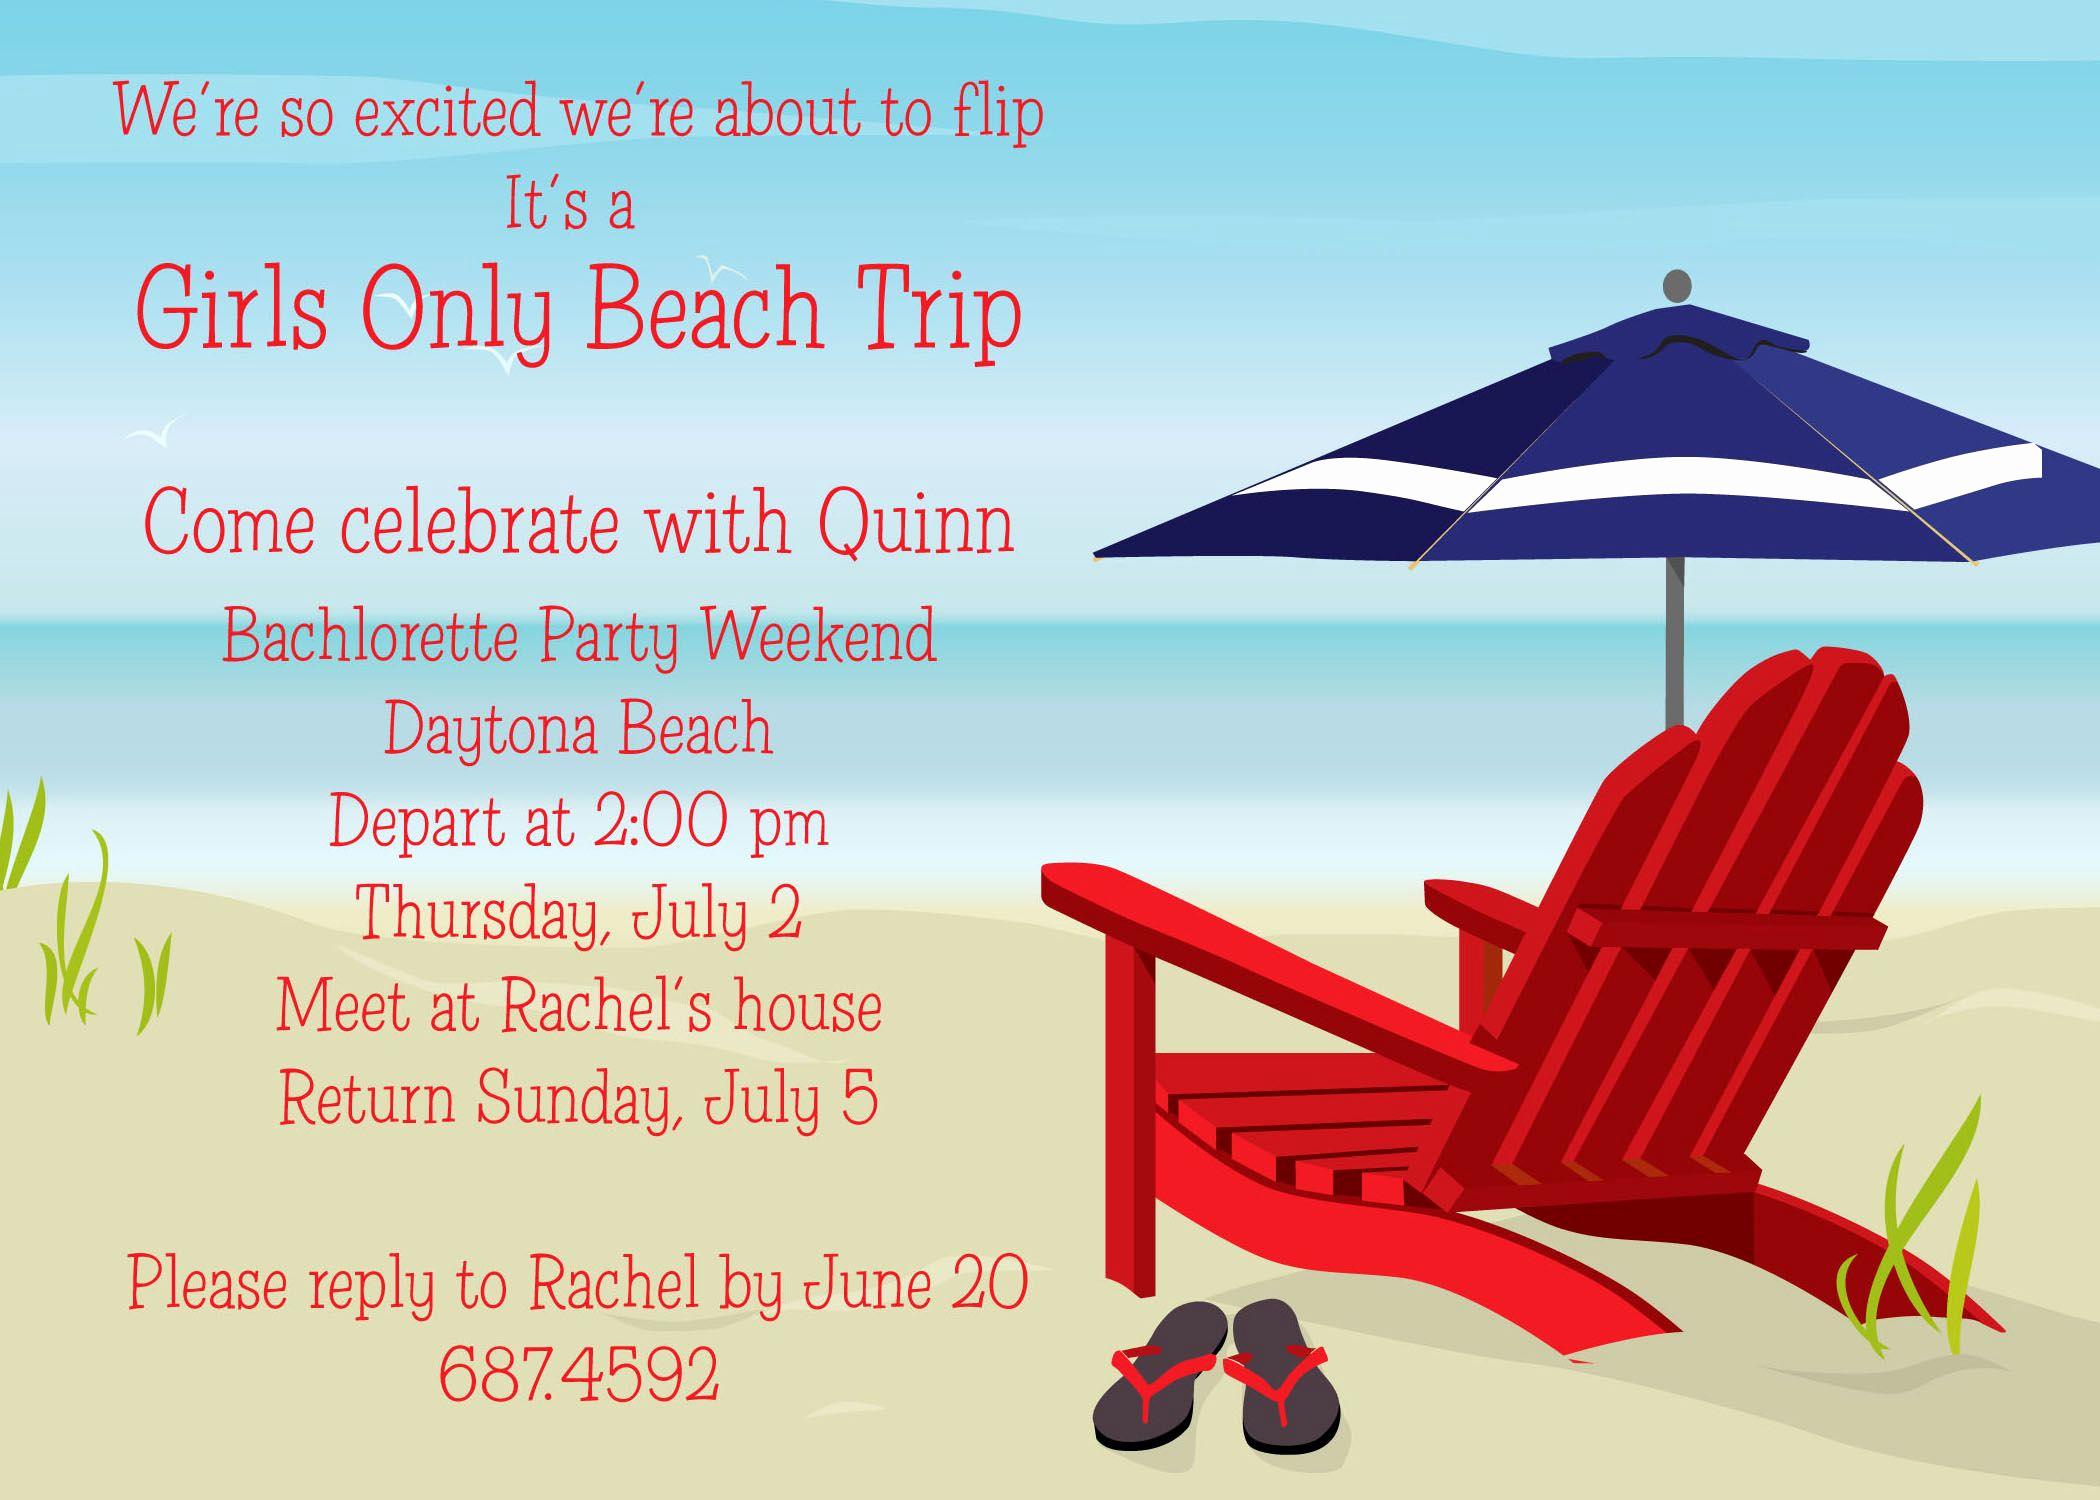 Beach Party Invitation Ideas New Beach Party Invitation Card and Invitation Ideas